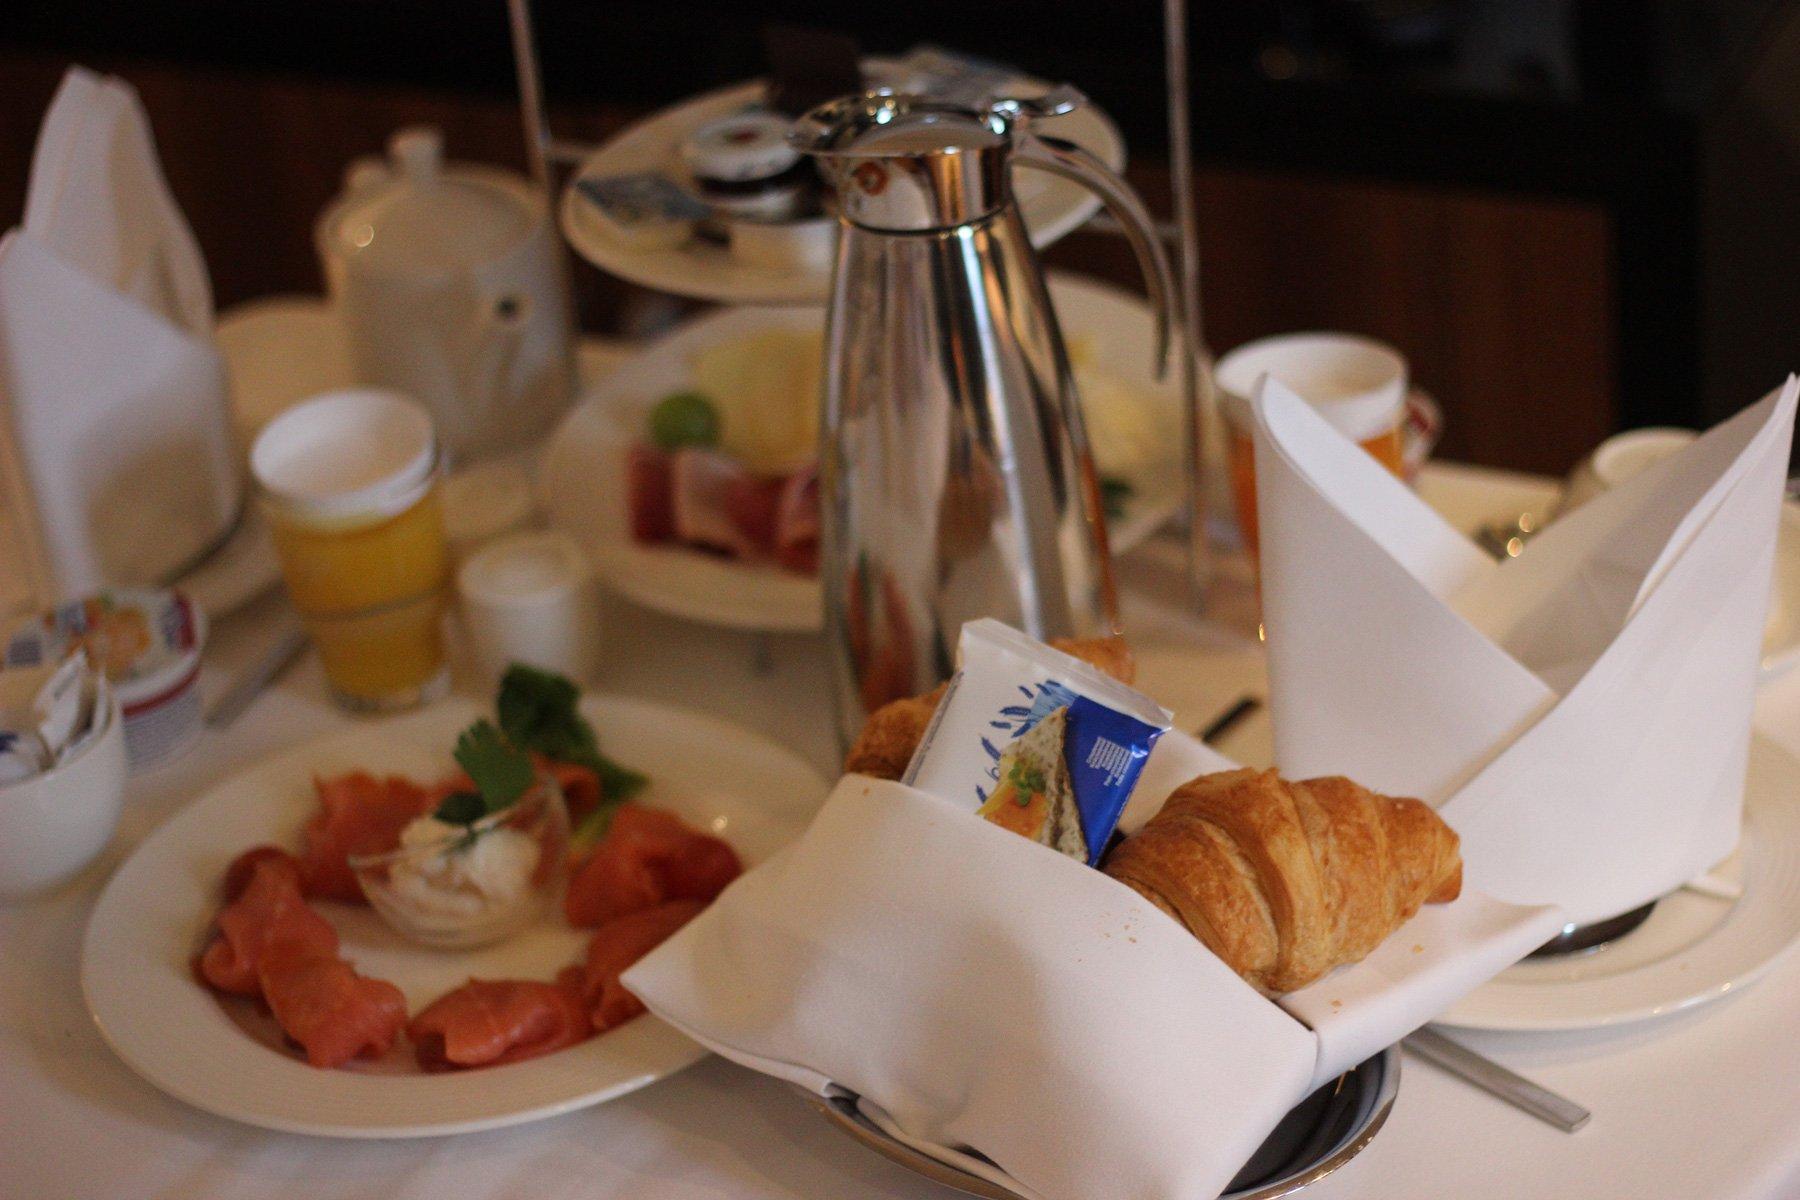 Radisson Blu - Frühstück ans Bett